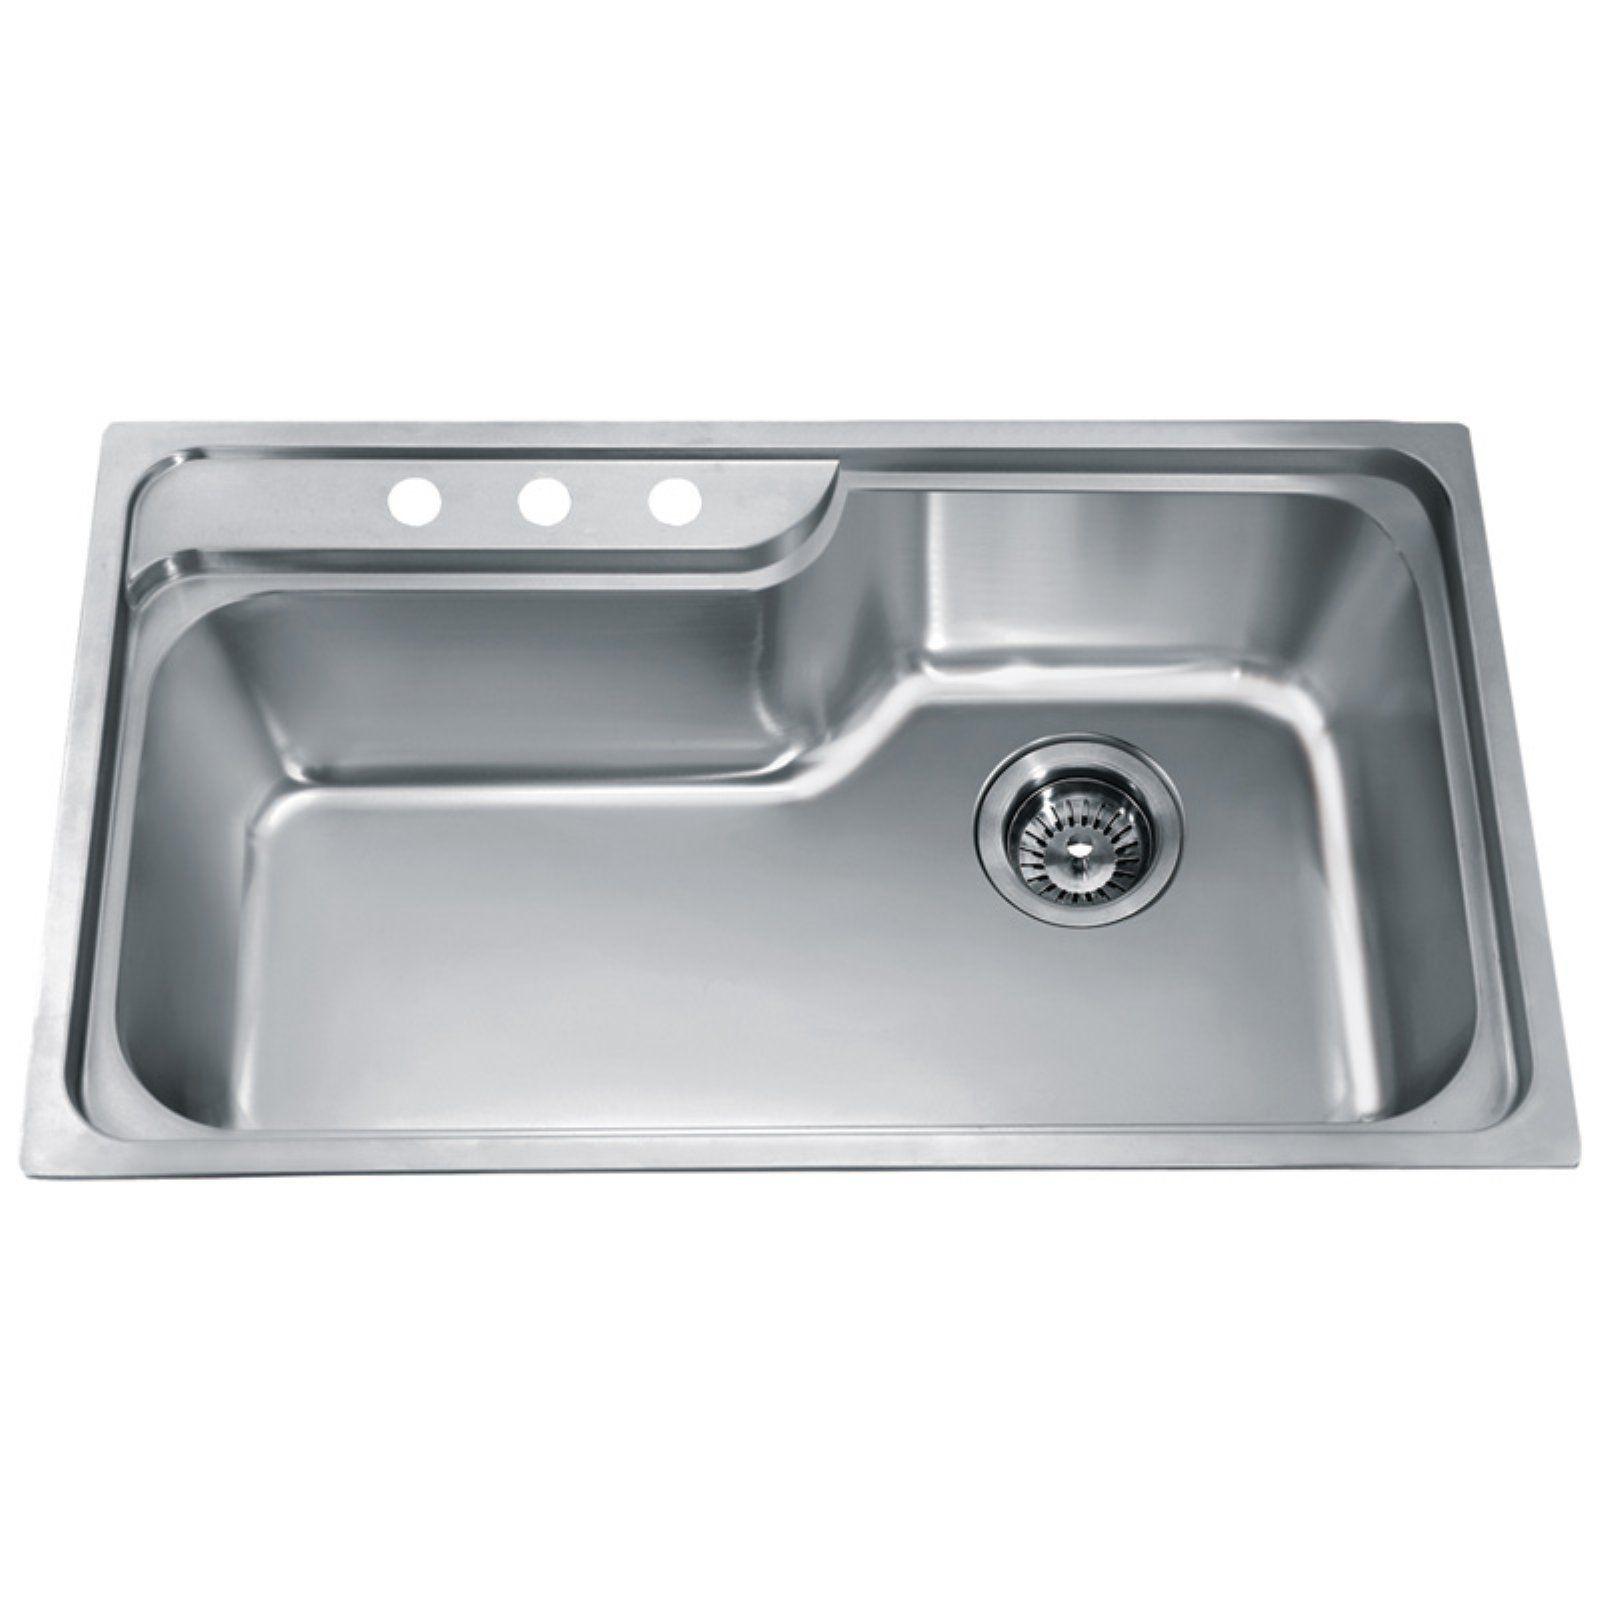 Dawn Ch368 Top Mount Single Bowl Stainless Steel Kitchen Sink